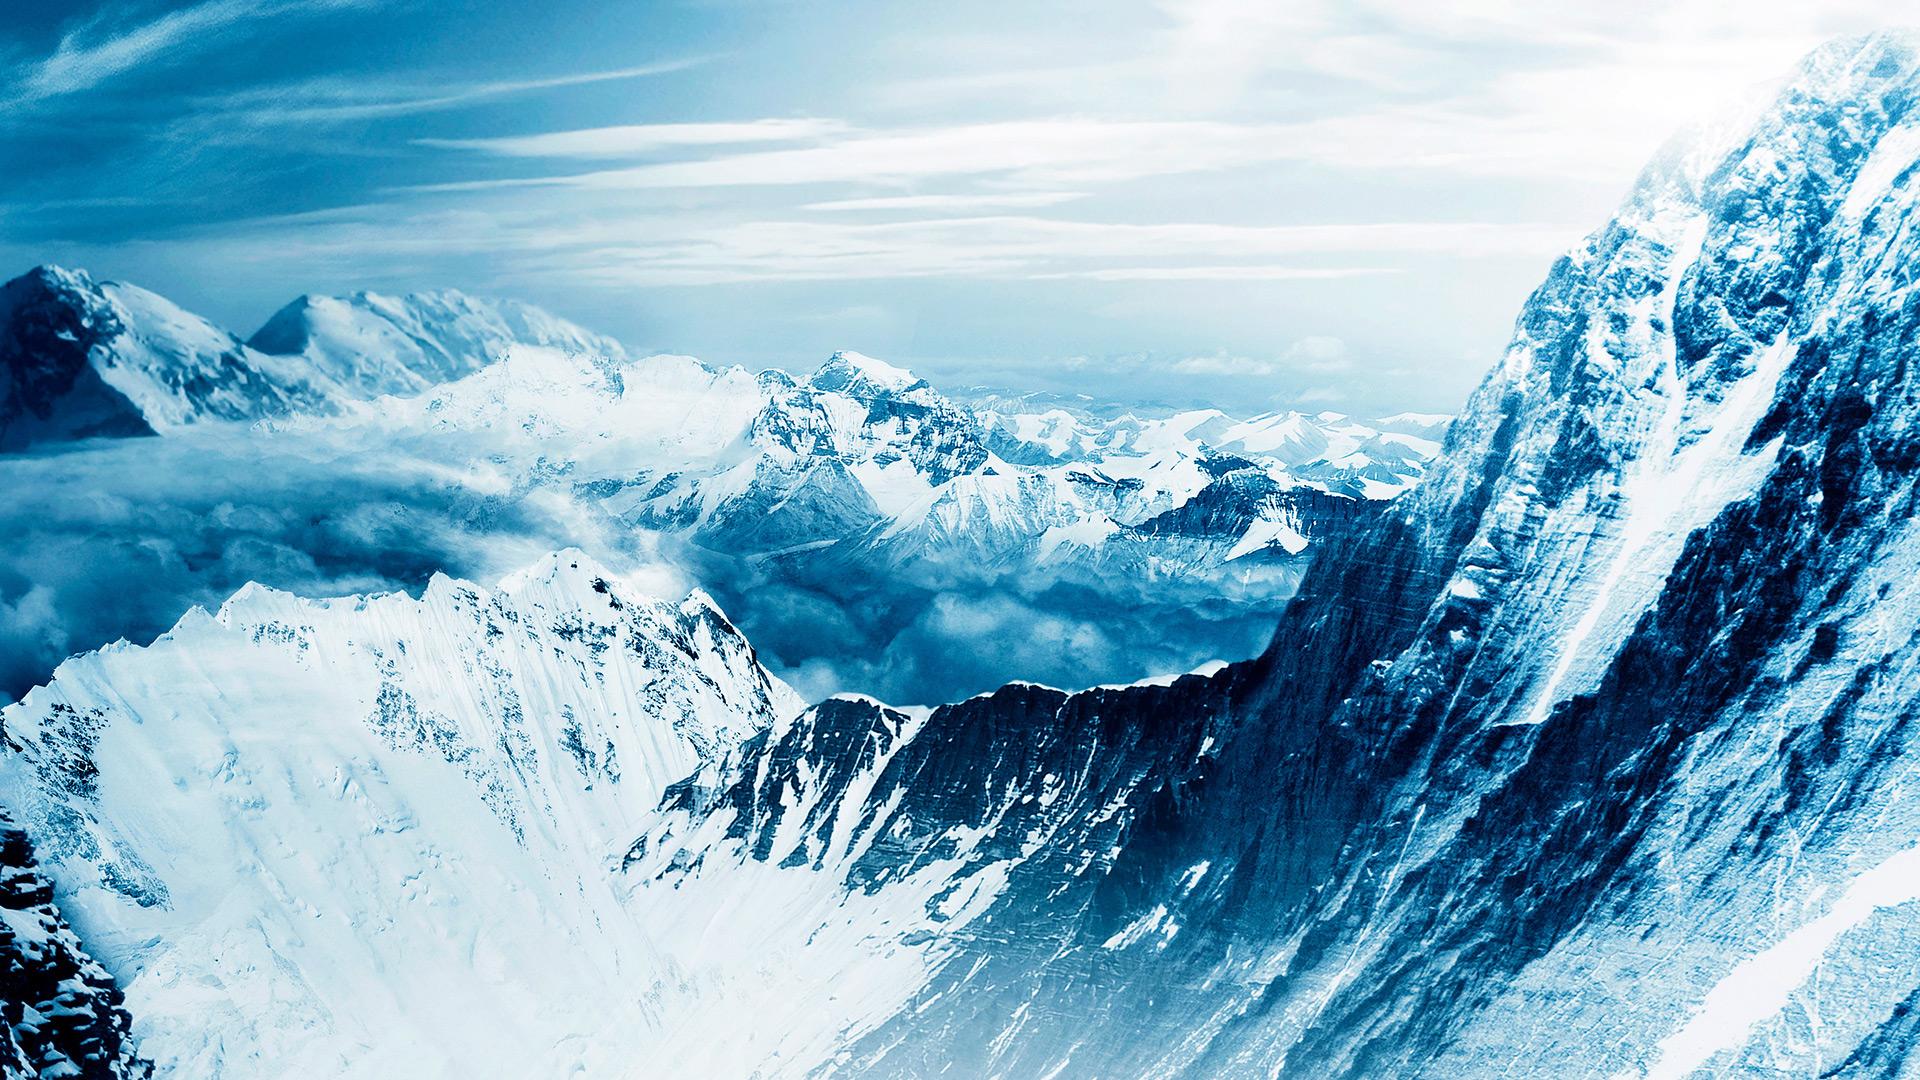 Everest (2015) Fond d'écran HD   Arrière-Plan   1920x1080   ID:691571 - Wallpaper Abyss